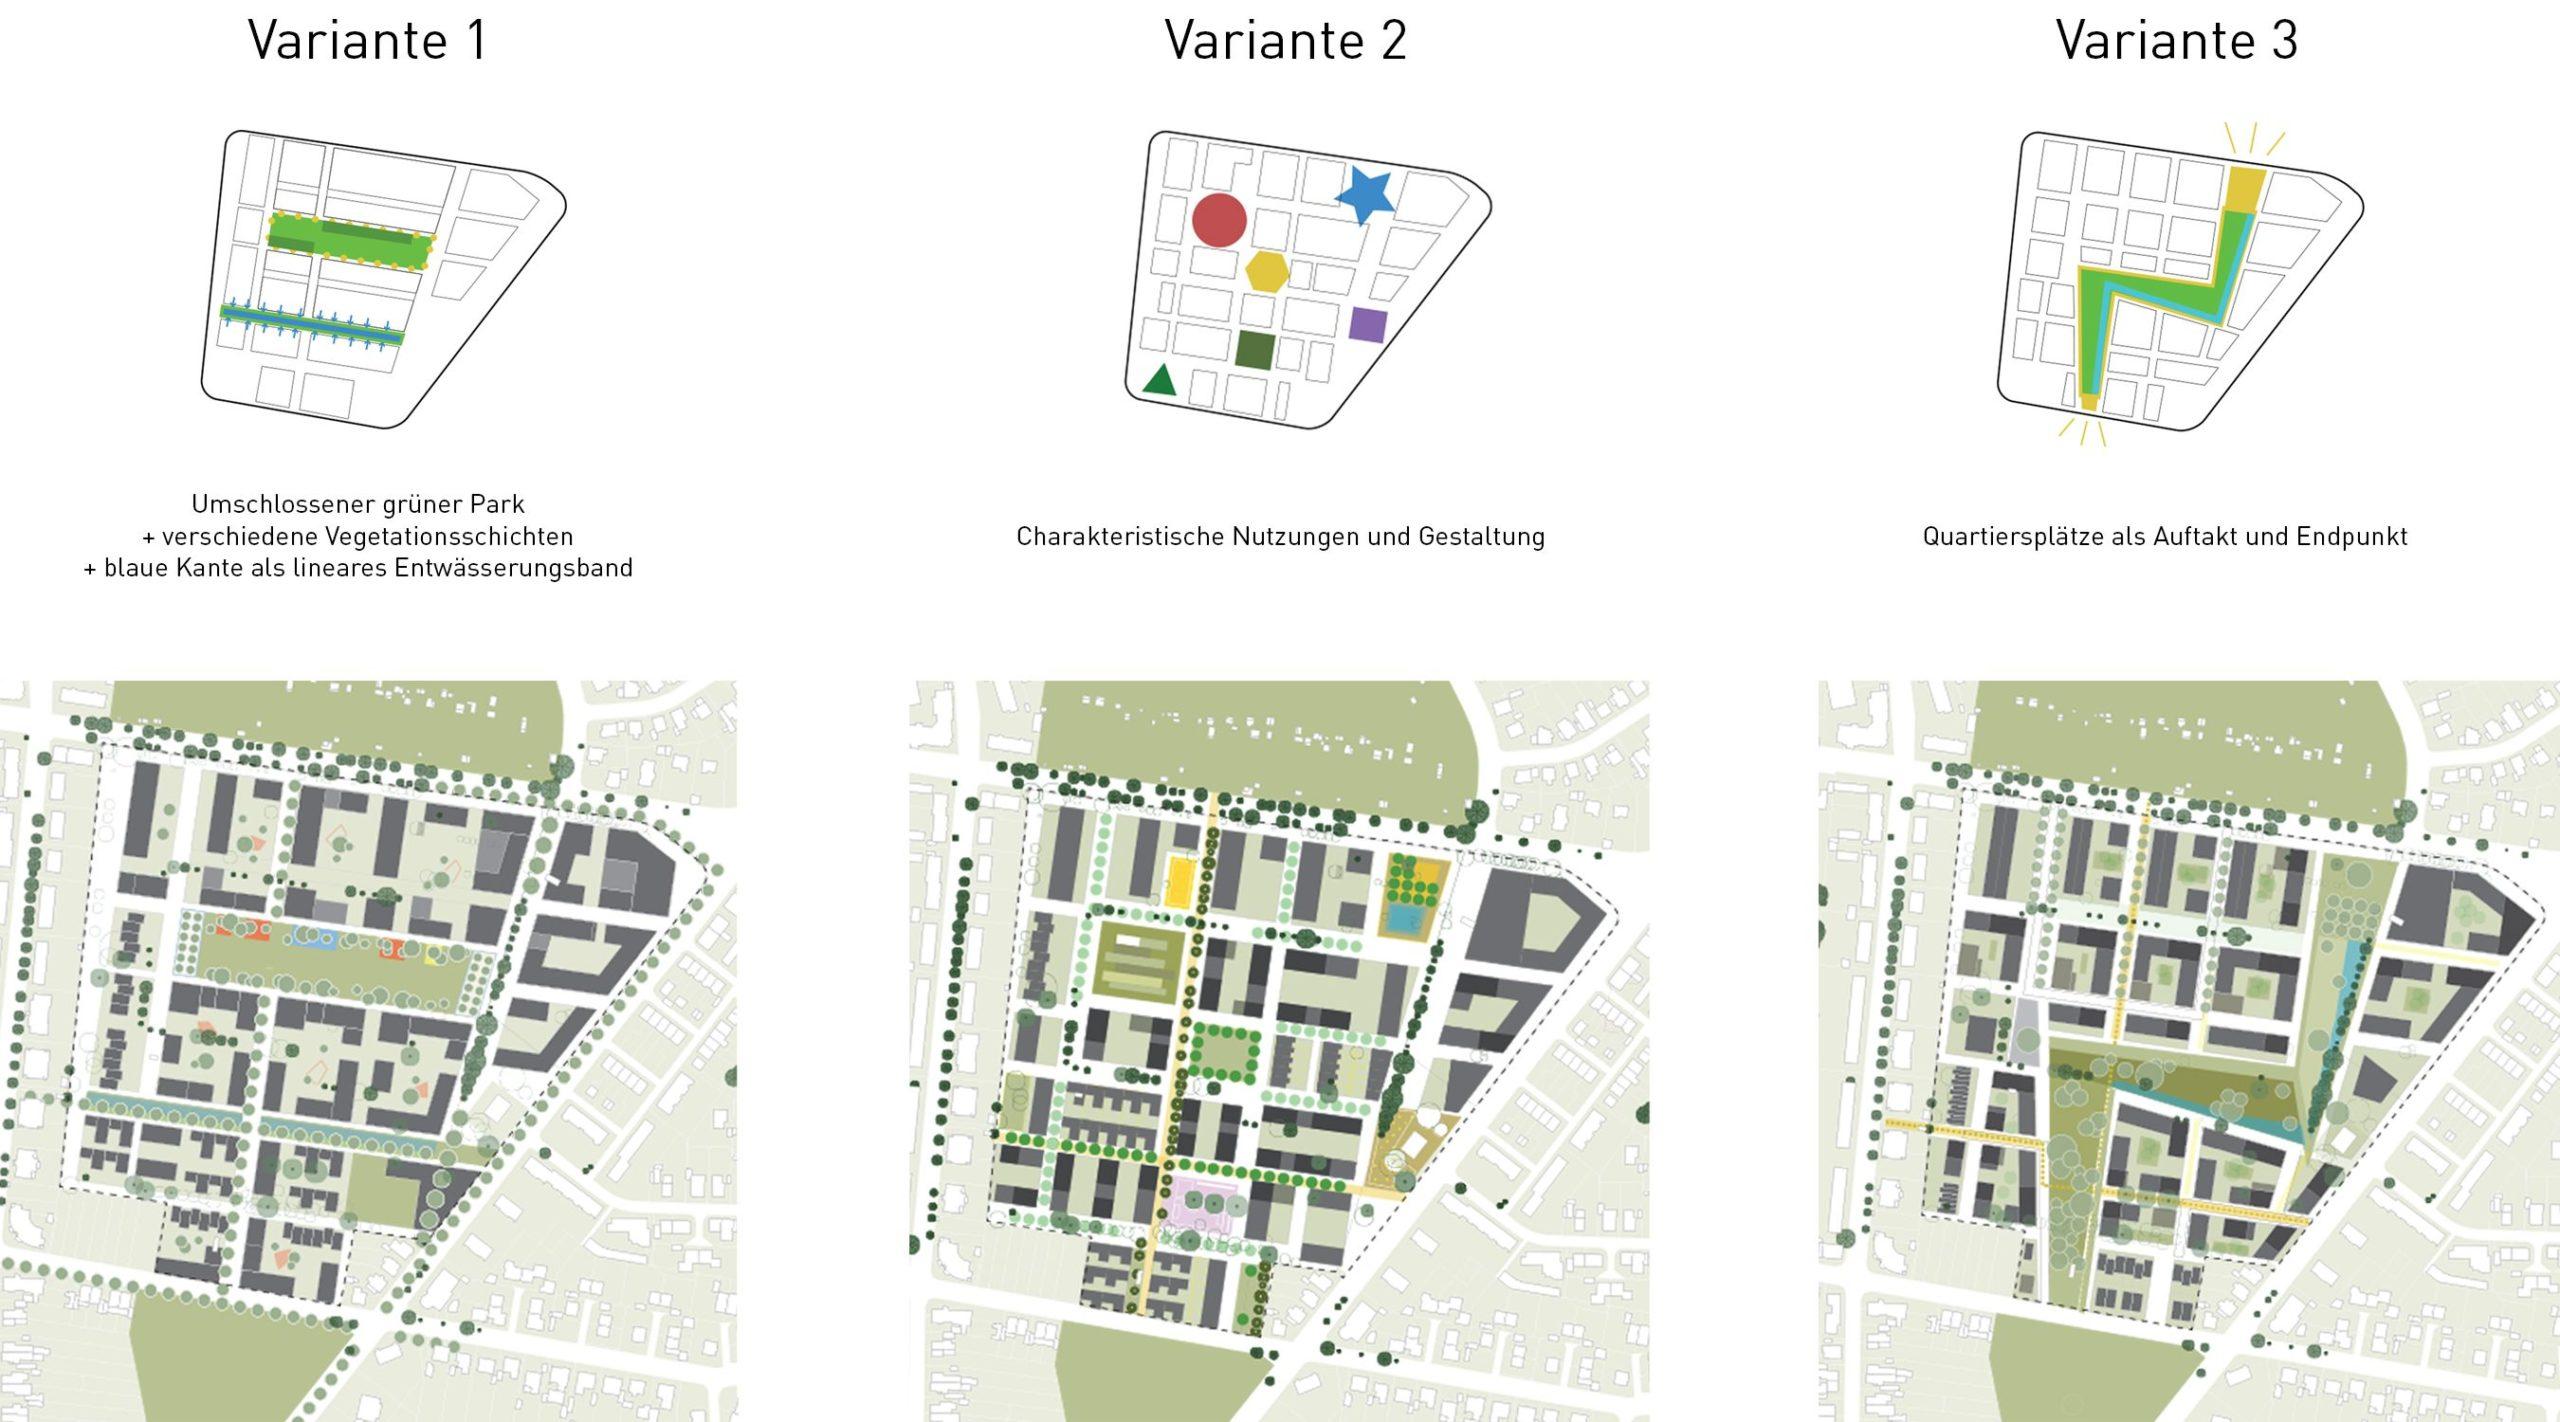 yellow z — Damloup-Kaserne Rheine